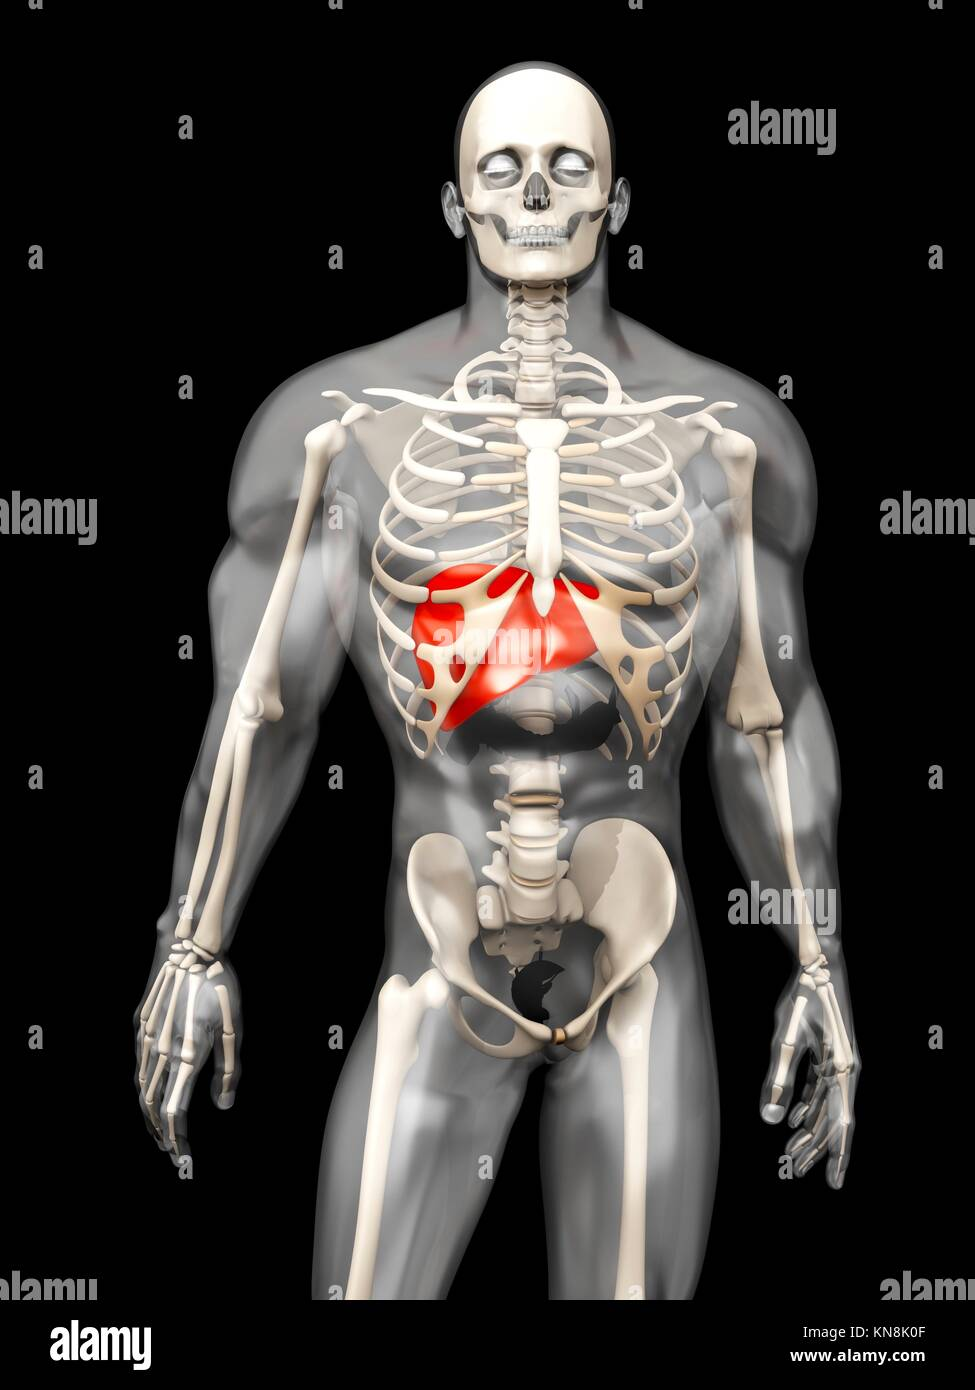 Abdominal Anatomy Stockfotos & Abdominal Anatomy Bilder - Alamy